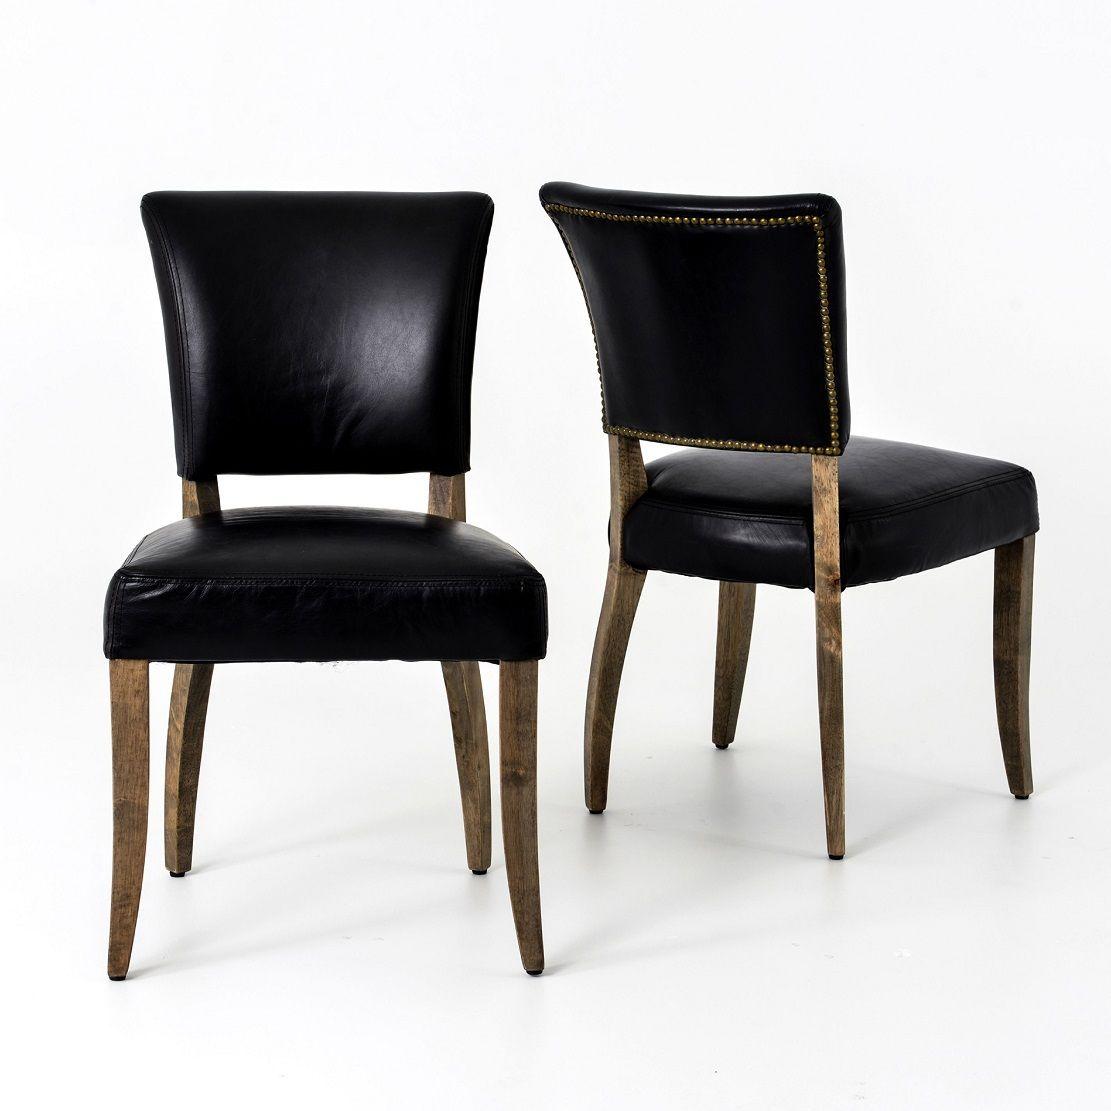 Mimi Saddle Black Leather Dining Chair Black Leather Dining Chairs Leather Dining Chairs Leather Dining